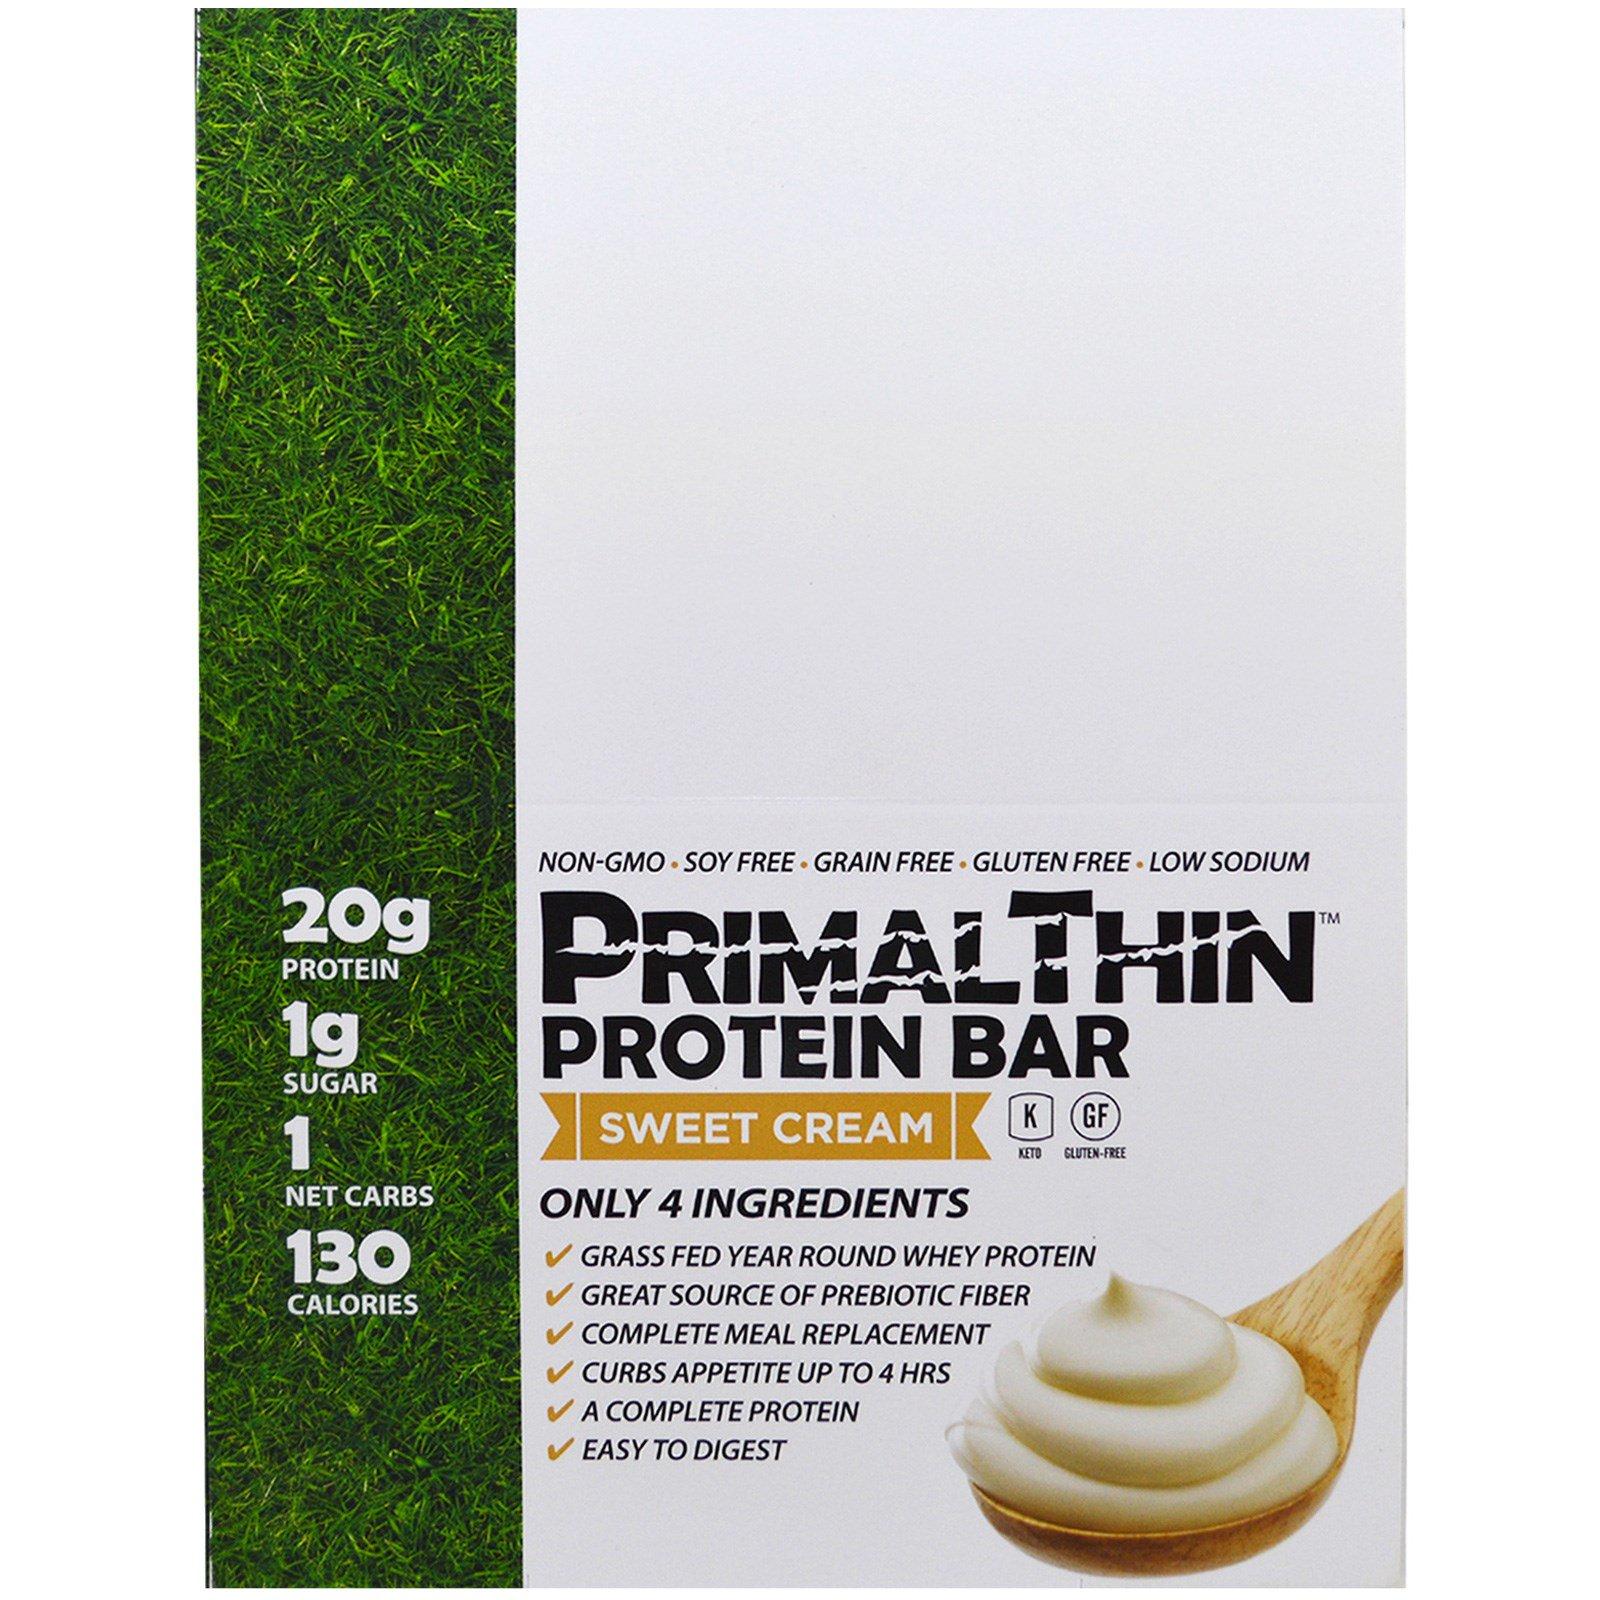 Julian Bakery, Primal Thin Protein Bar, Sweet Cream, 12 Bars, 1.9 oz (54 g) Each